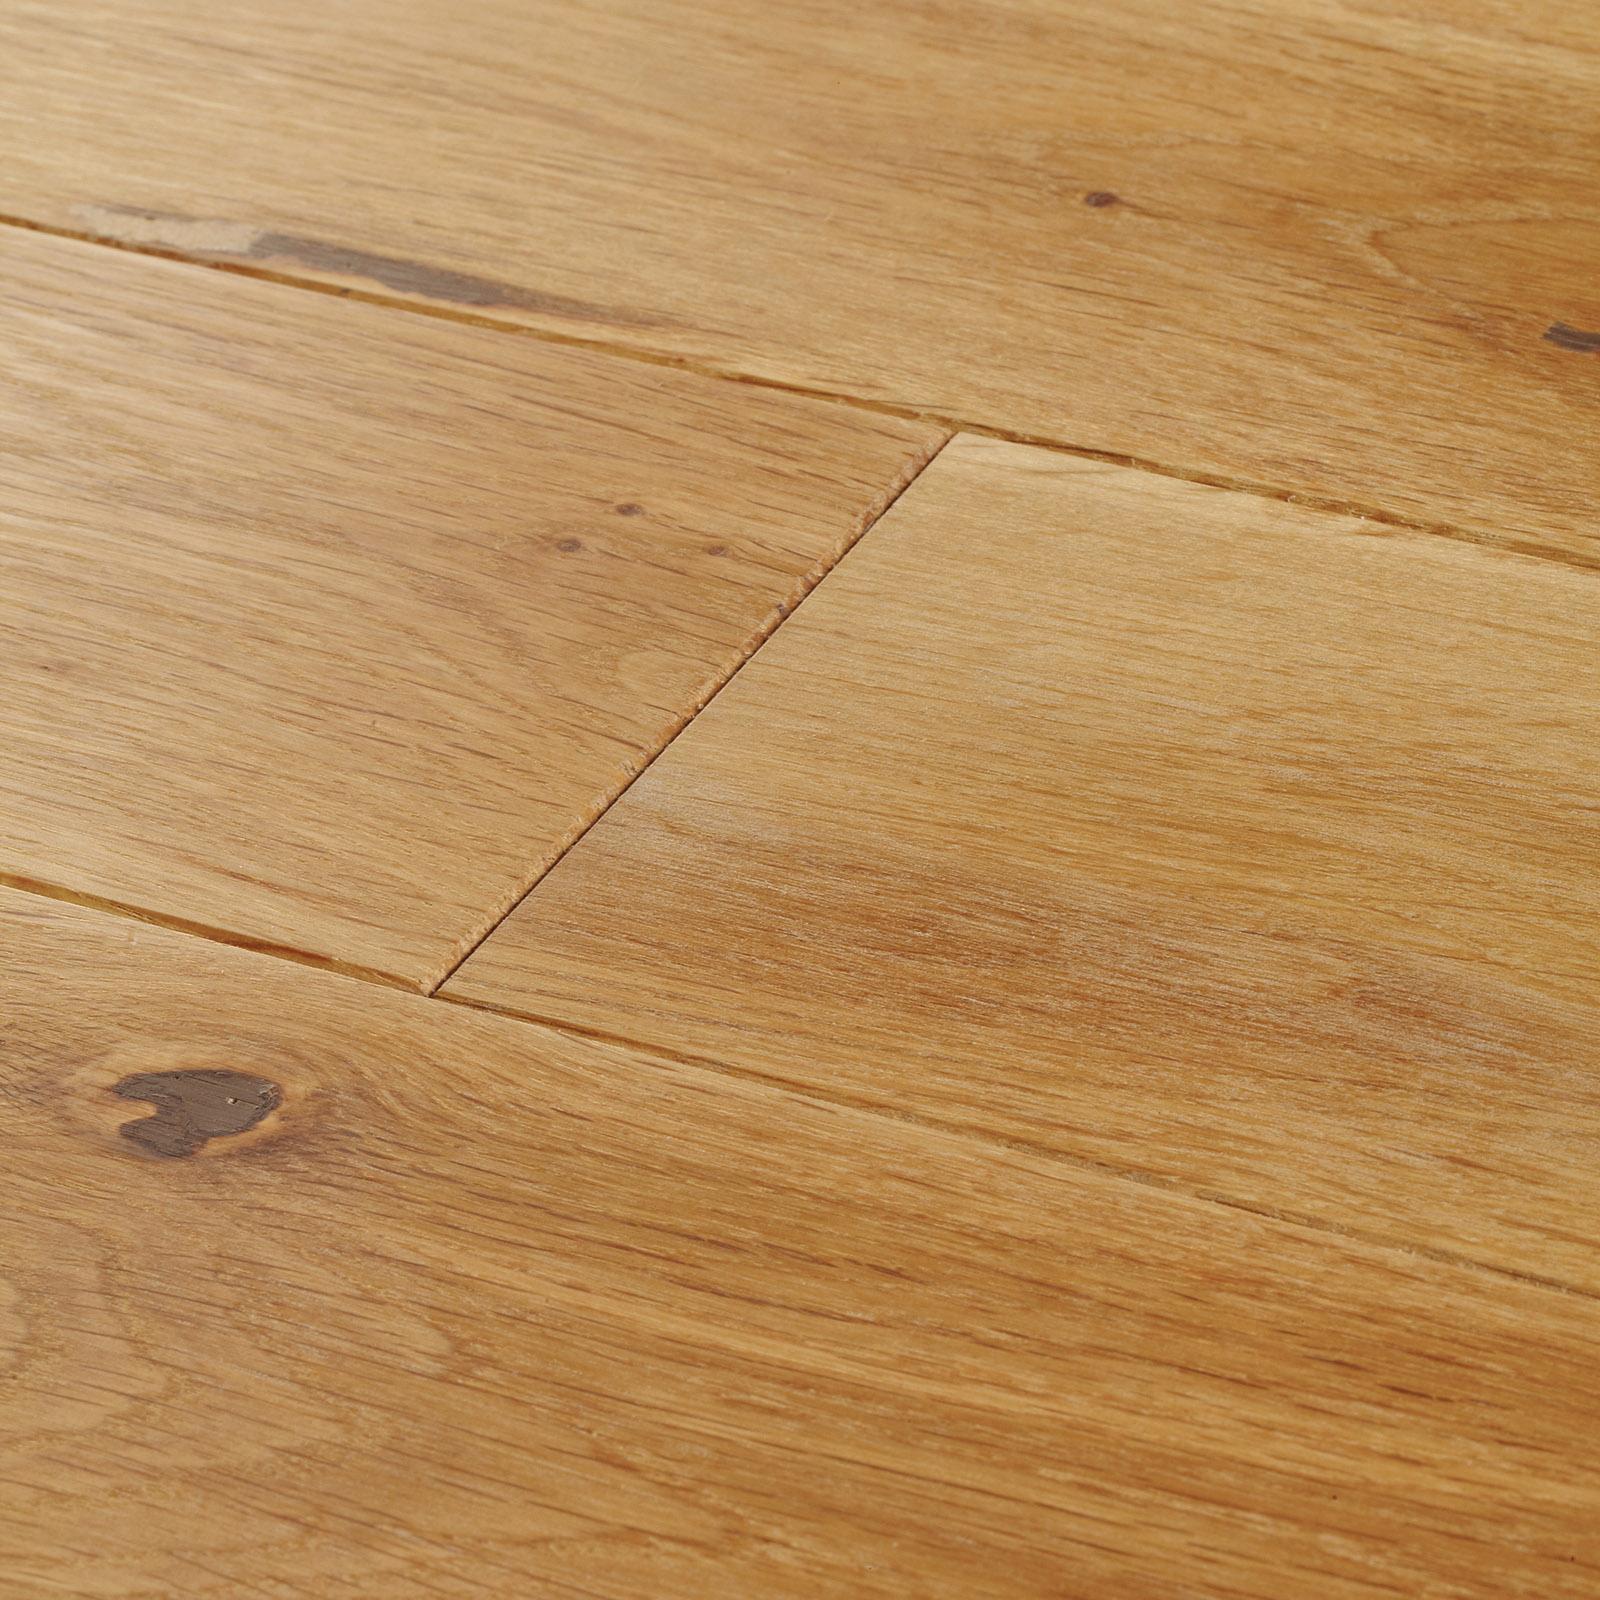 Solid hardwood flooring york rustic white oak